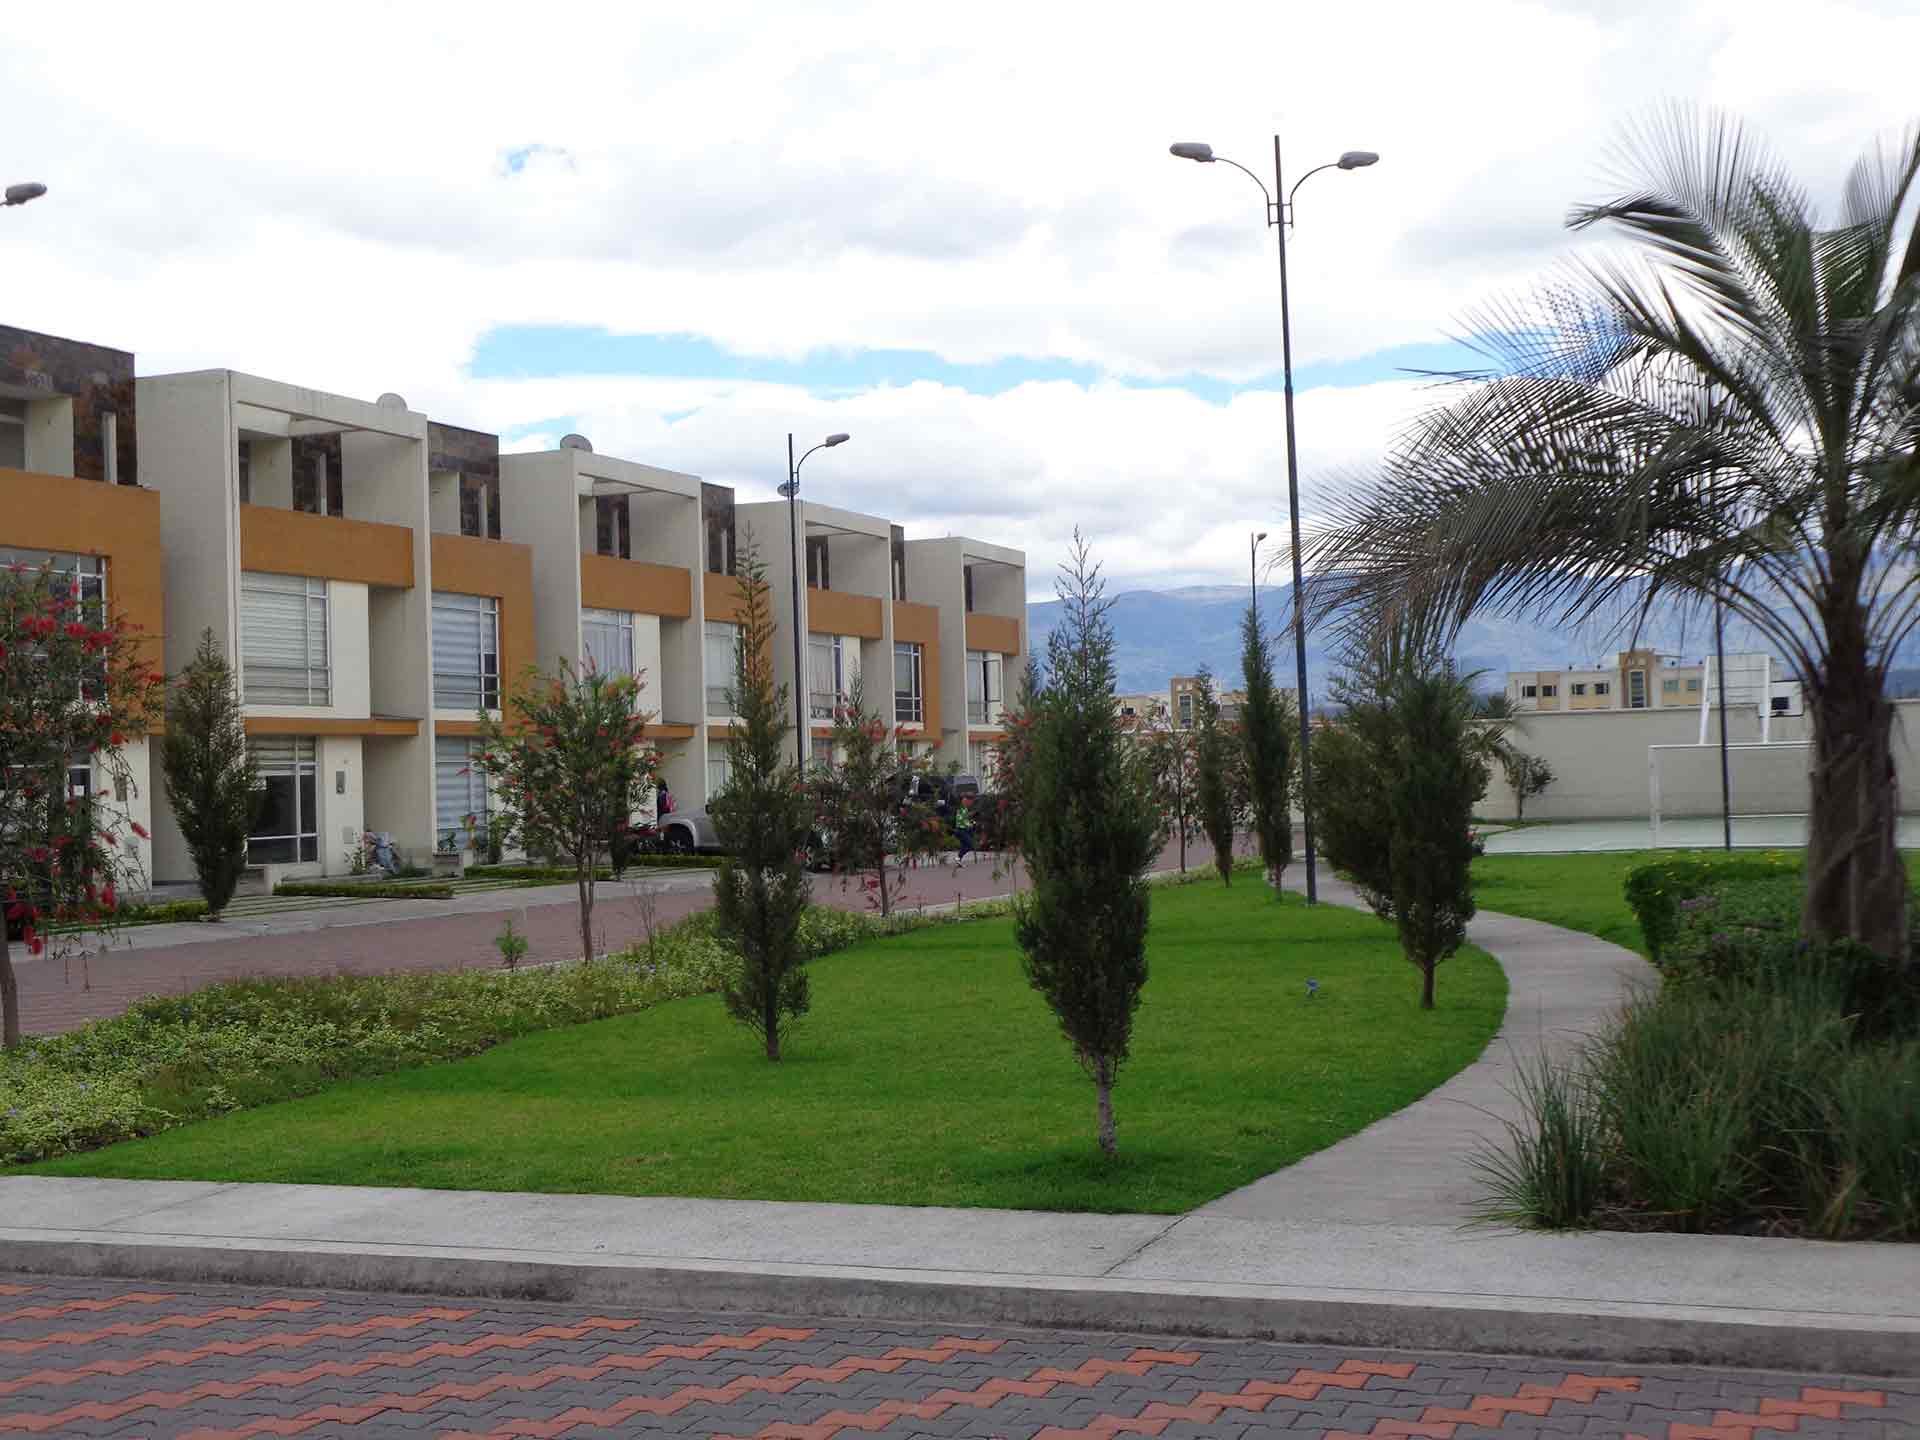 Panorama Gardens – casa 3 plantas de 140 m² – hermosas casas conjunto privado sector Capelo